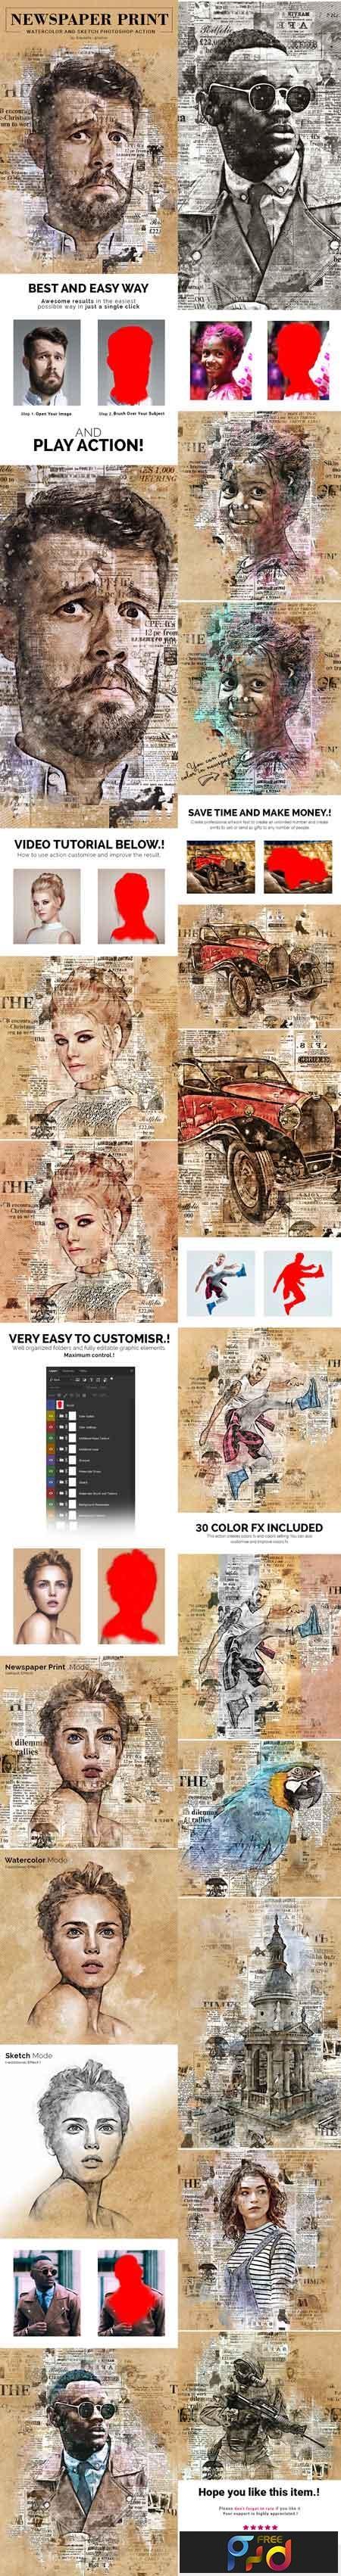 Newspaper Print Photoshop Action 22712187 1